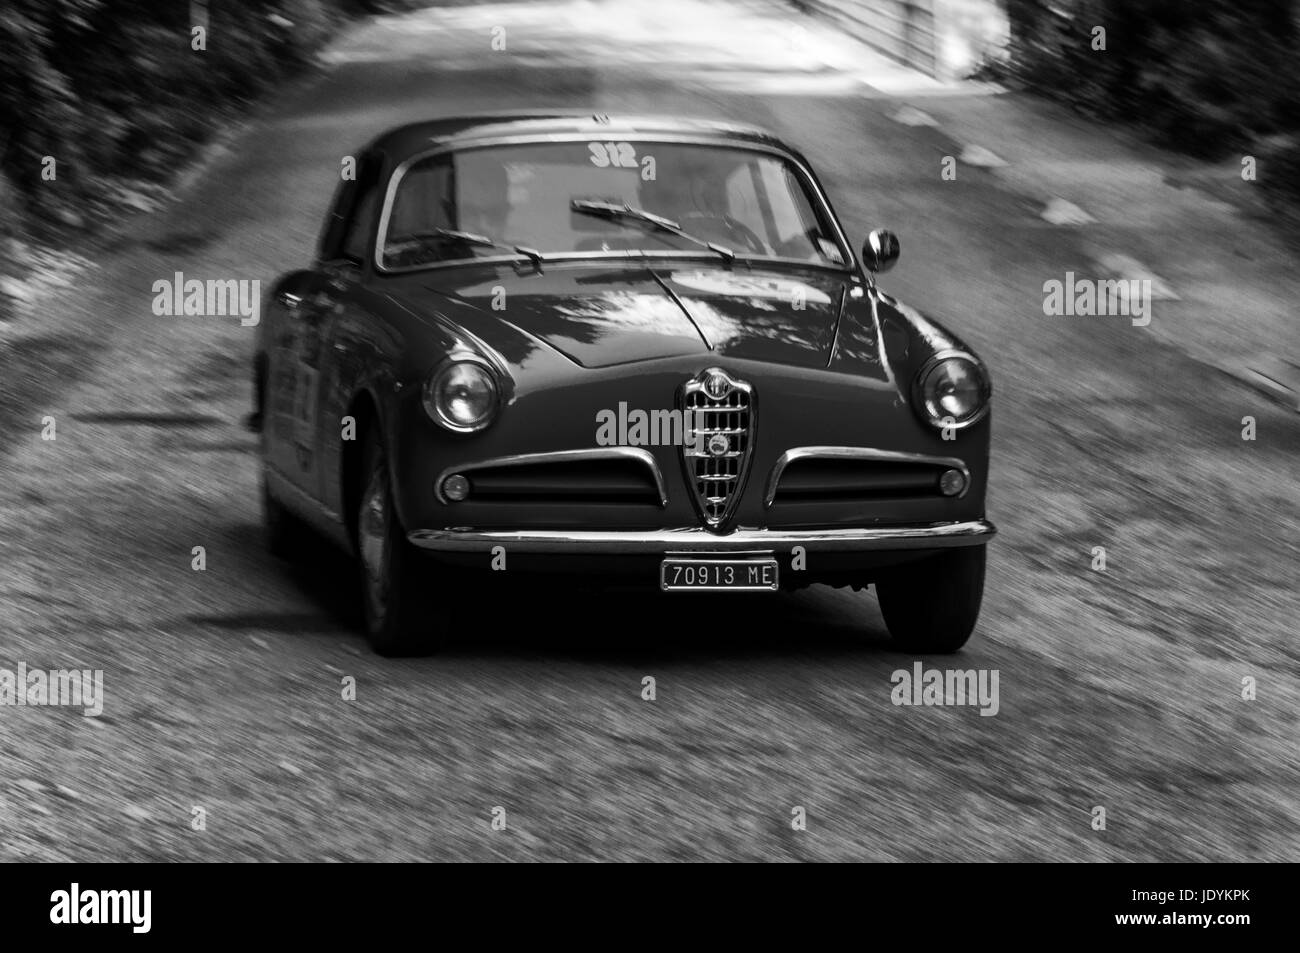 ALFA ROMEO GIULIETTA SPRINT 1956 on an old racing car in rally Mille ...